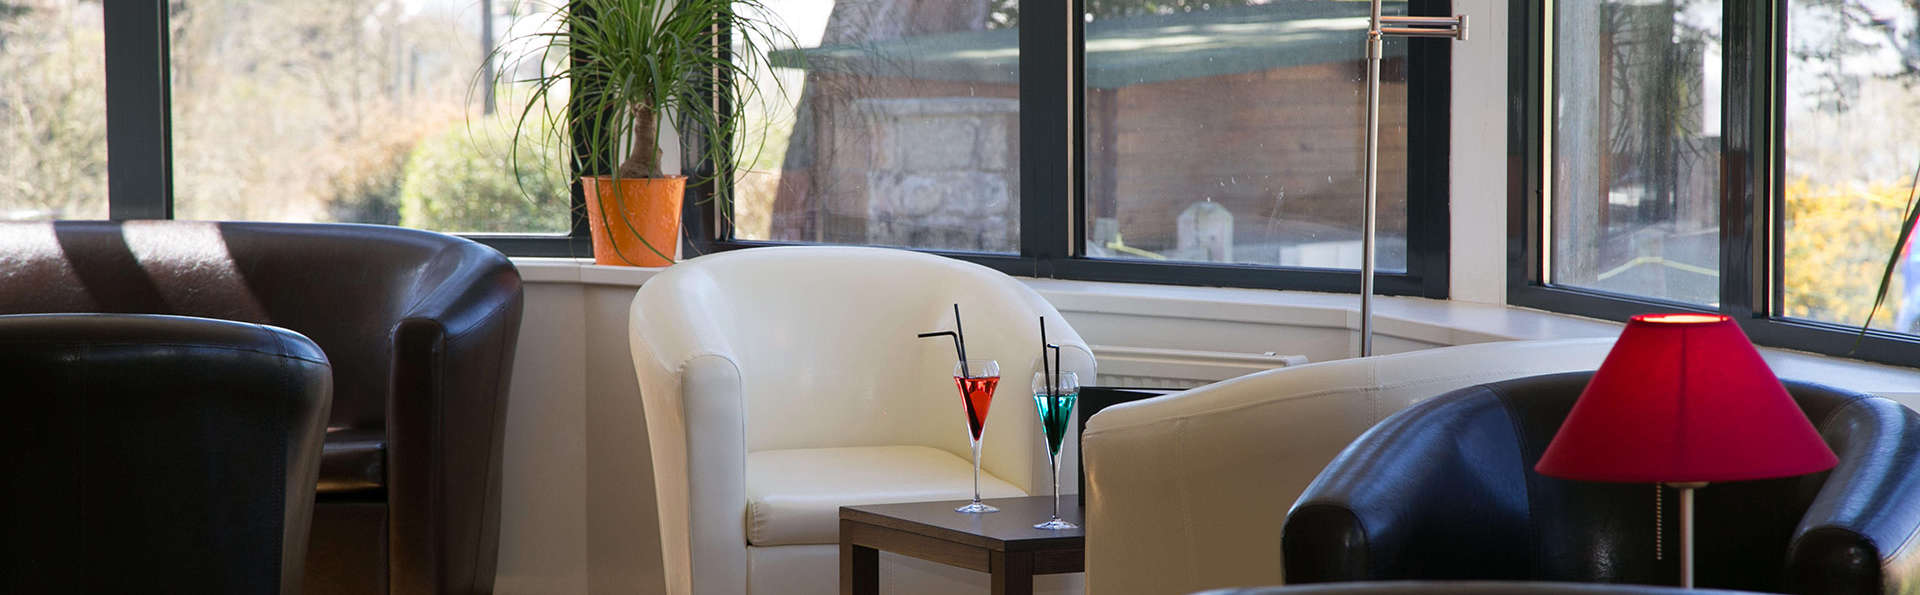 Hôtel Restaurant Spa du Tumulus - EDIT_lobby.jpg